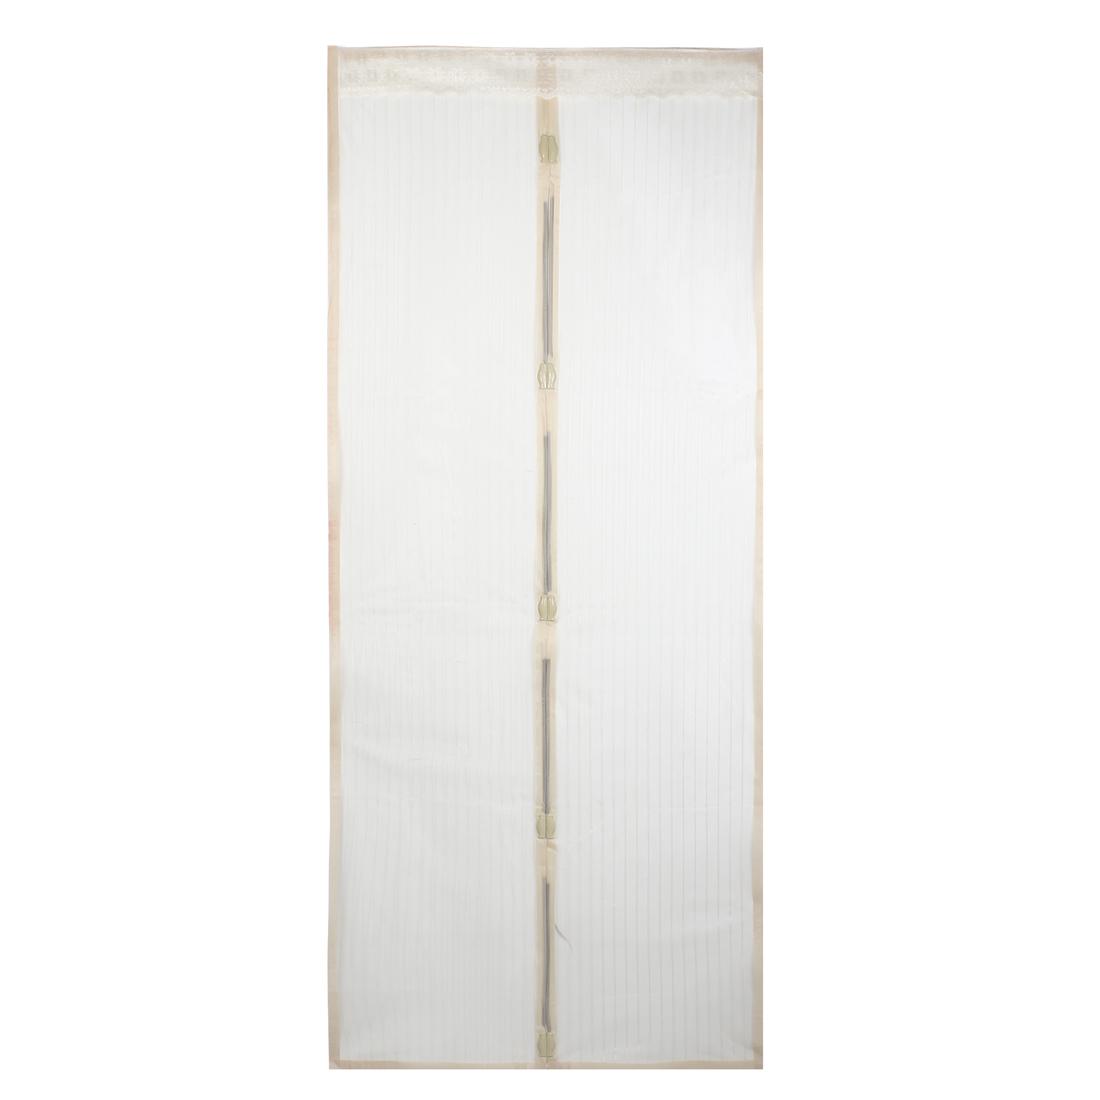 "Beige Floral Edge Decor Nylon Door Panels Magnetic Curtain 81"" x 18"""